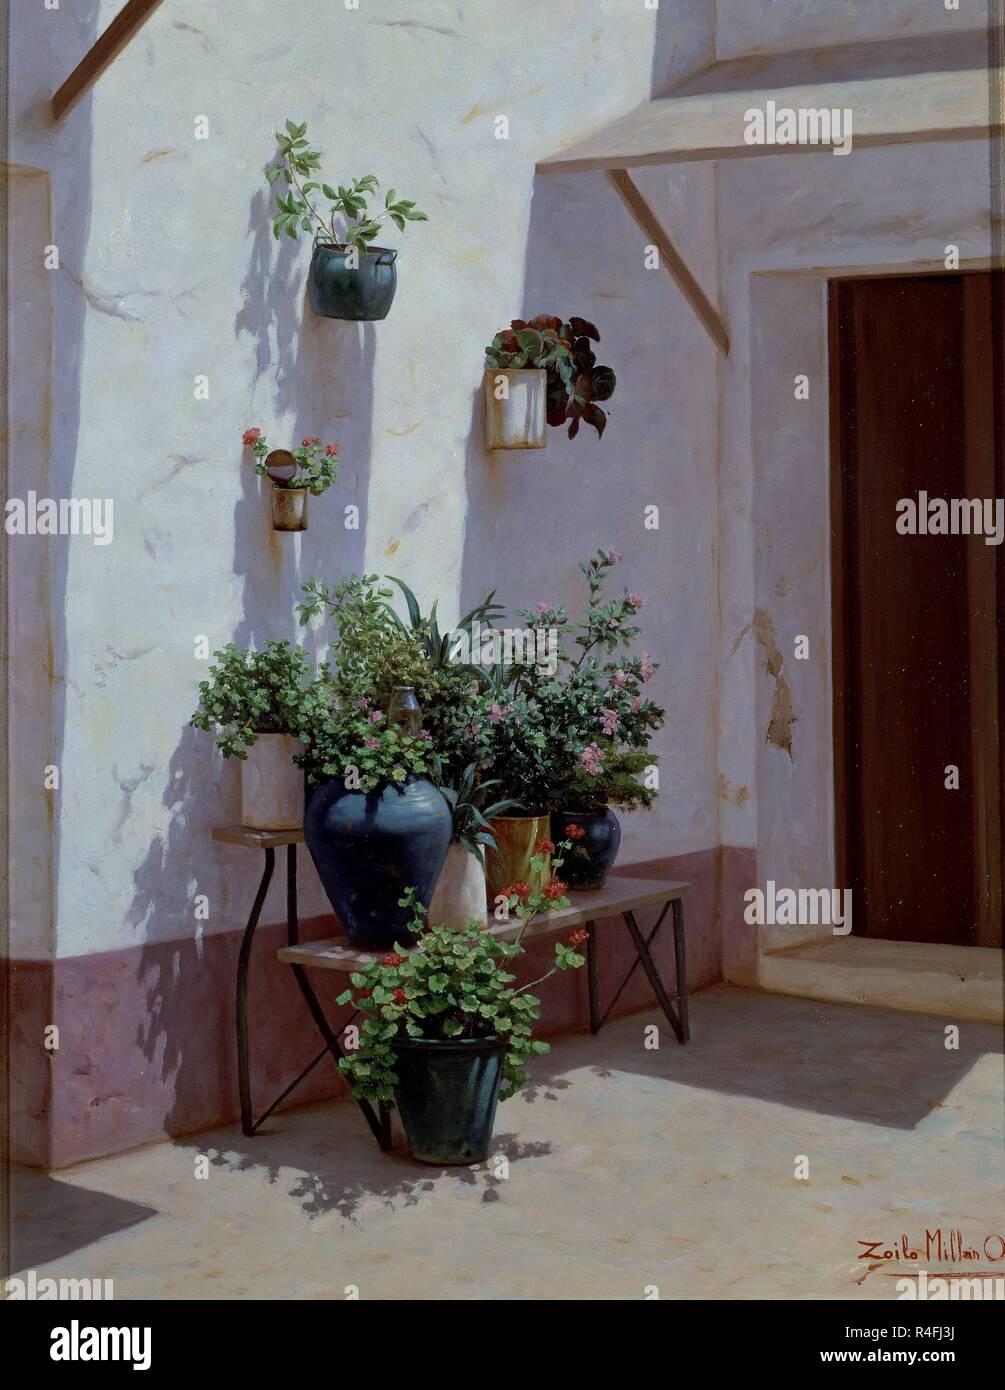 Patio Andaluz Stock Photos Patio Andaluz Stock Images Alamy